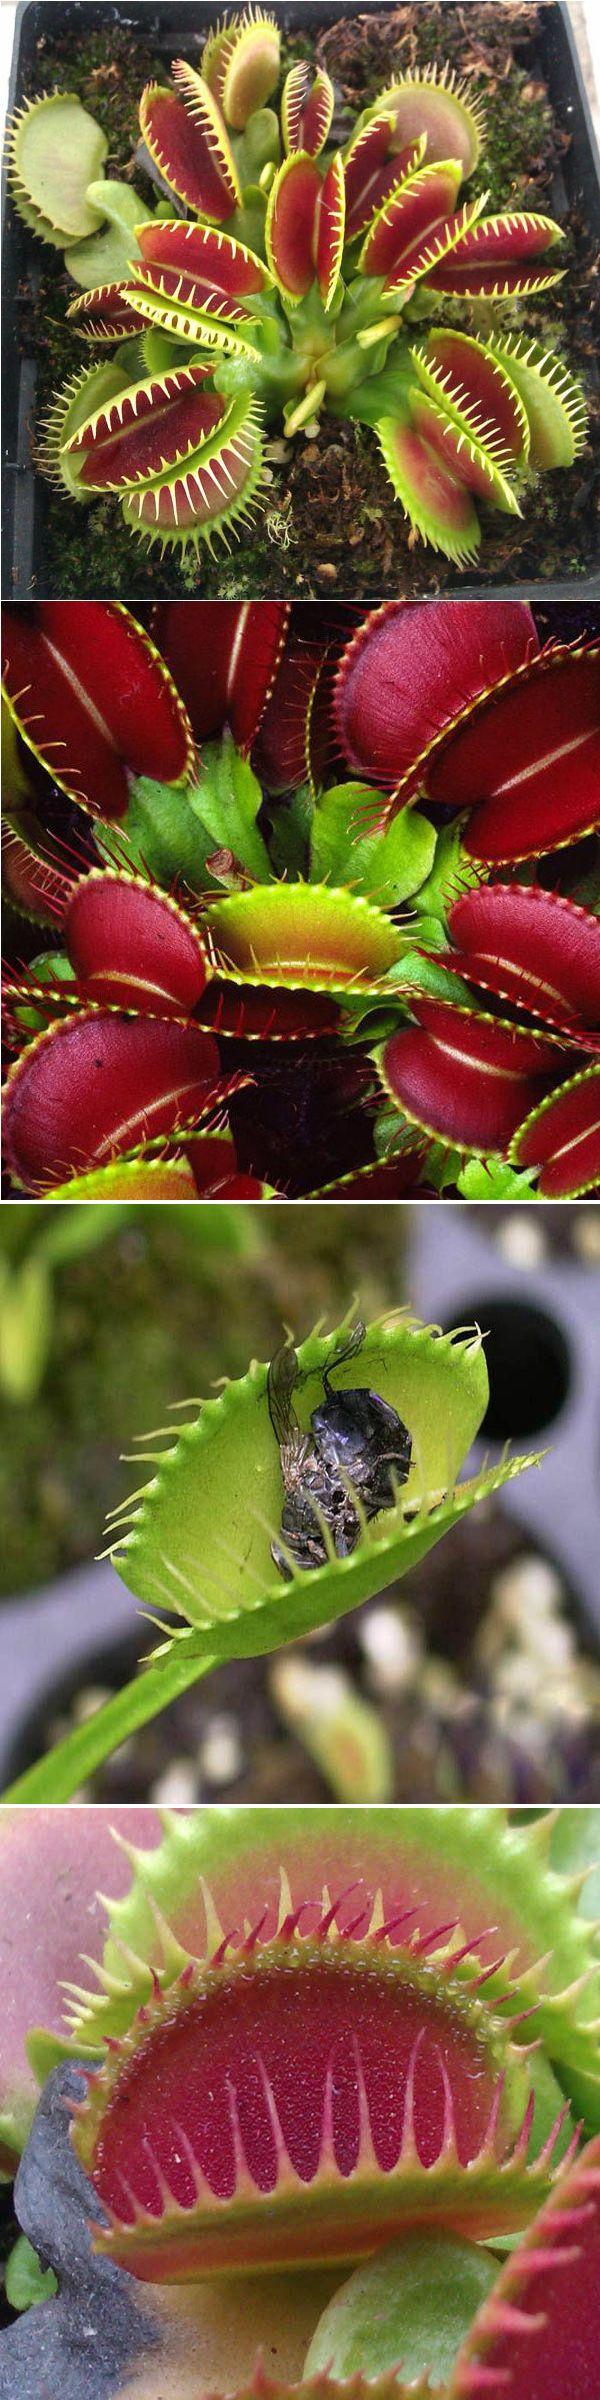 100pcs Catchfly Potted Plant Seeds Garden Venus Flytrap Insectivorous Plant